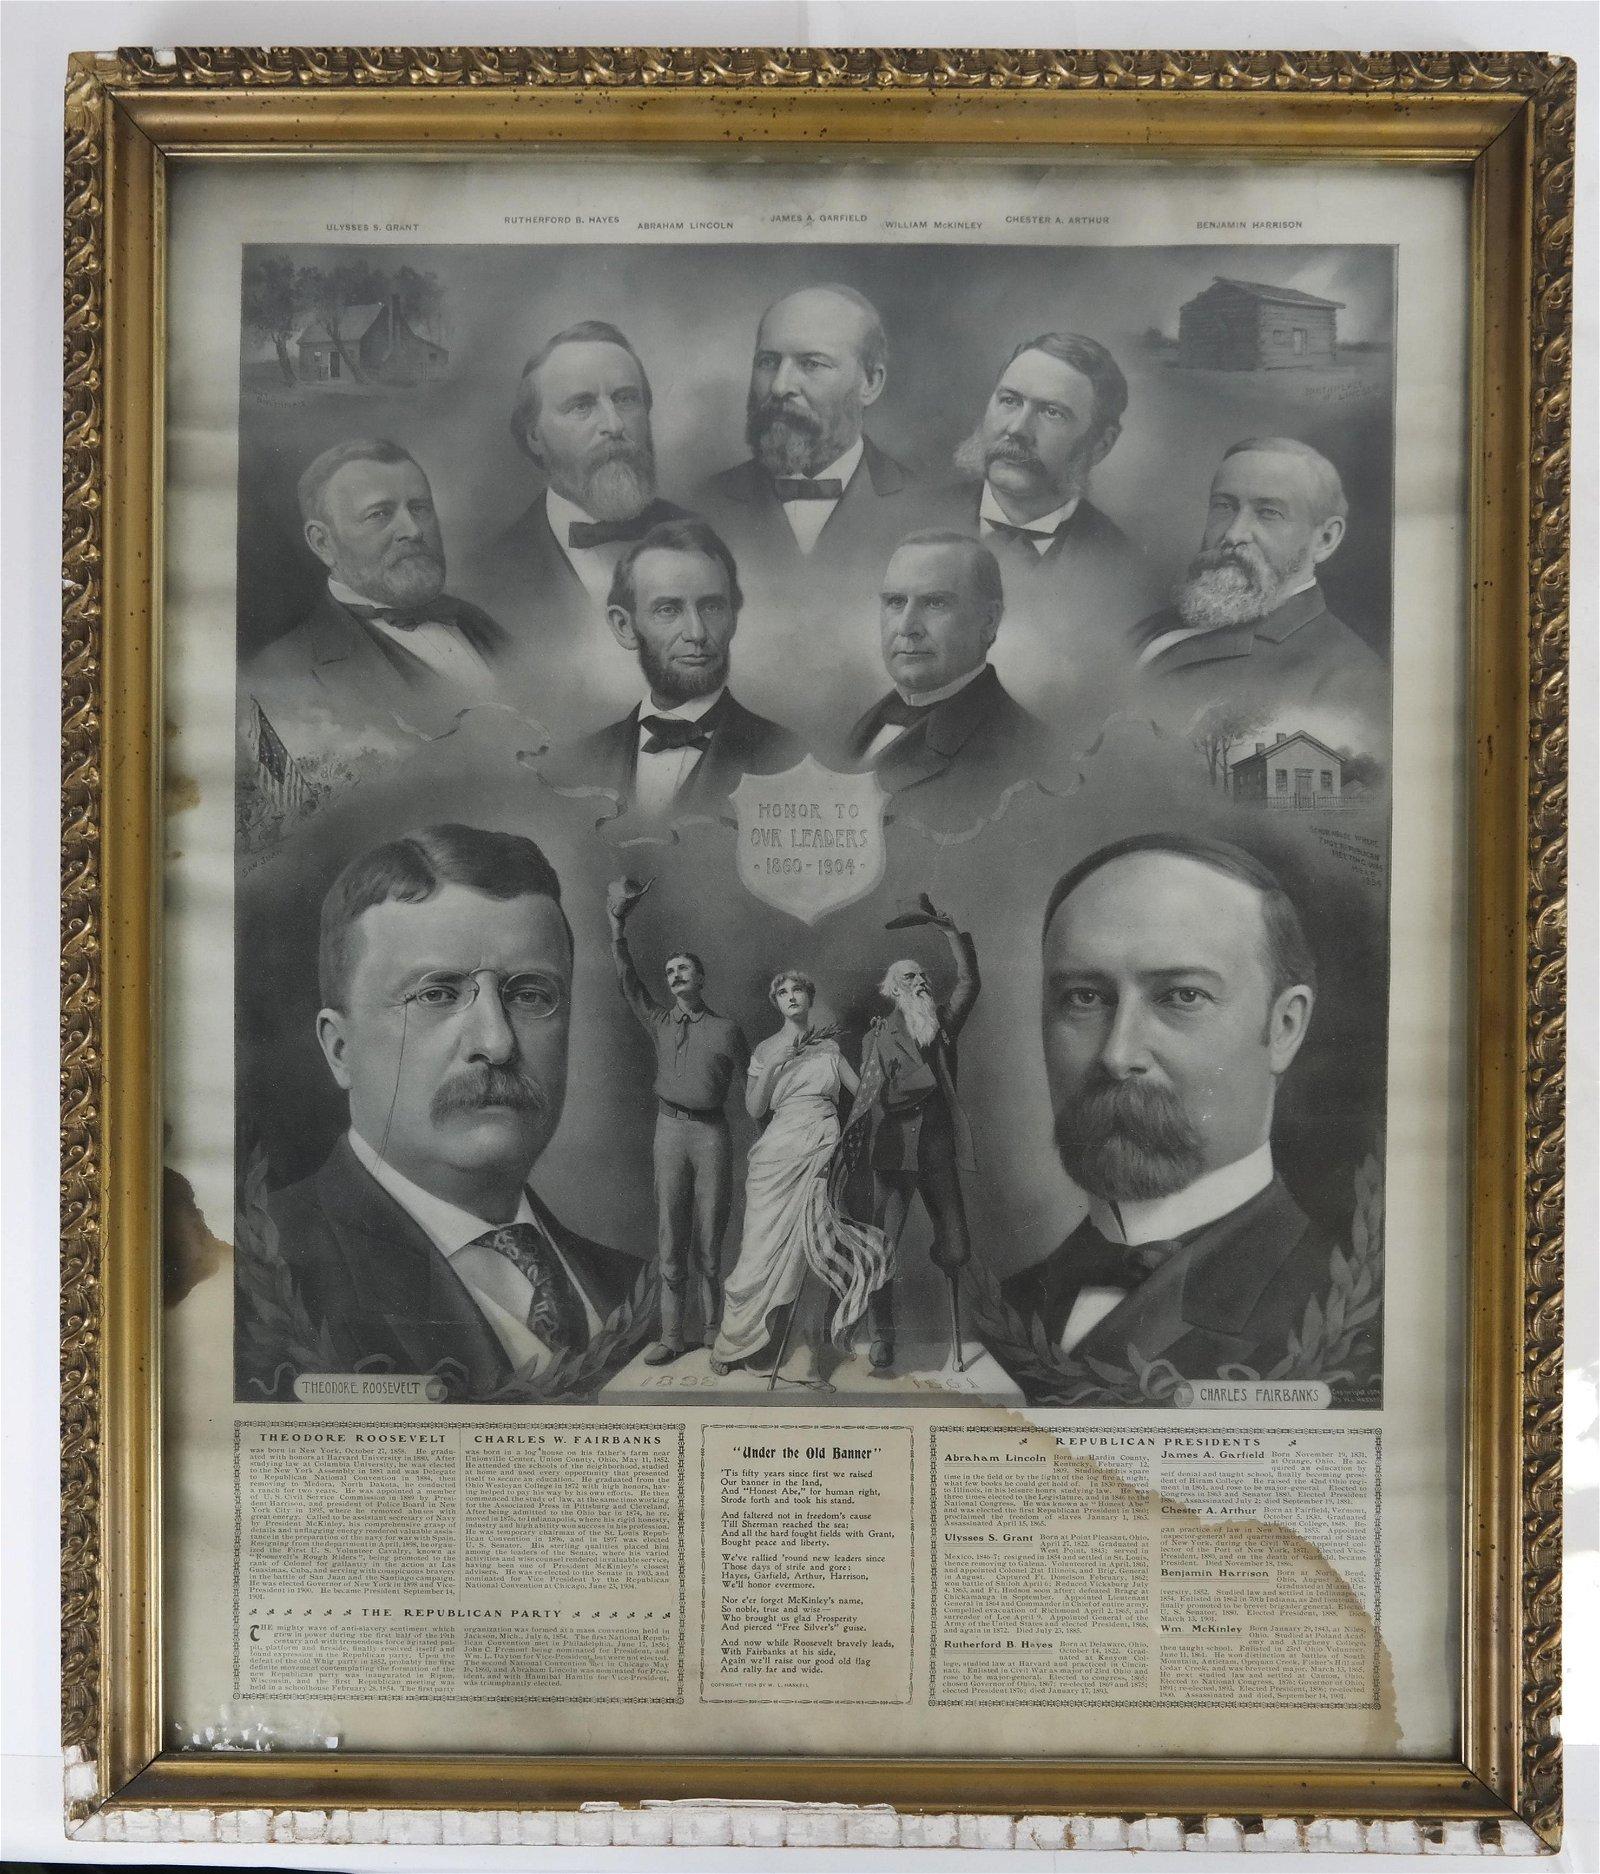 T. Roosevelt & C. W. Fairbanks 1904 Jugate Bandana